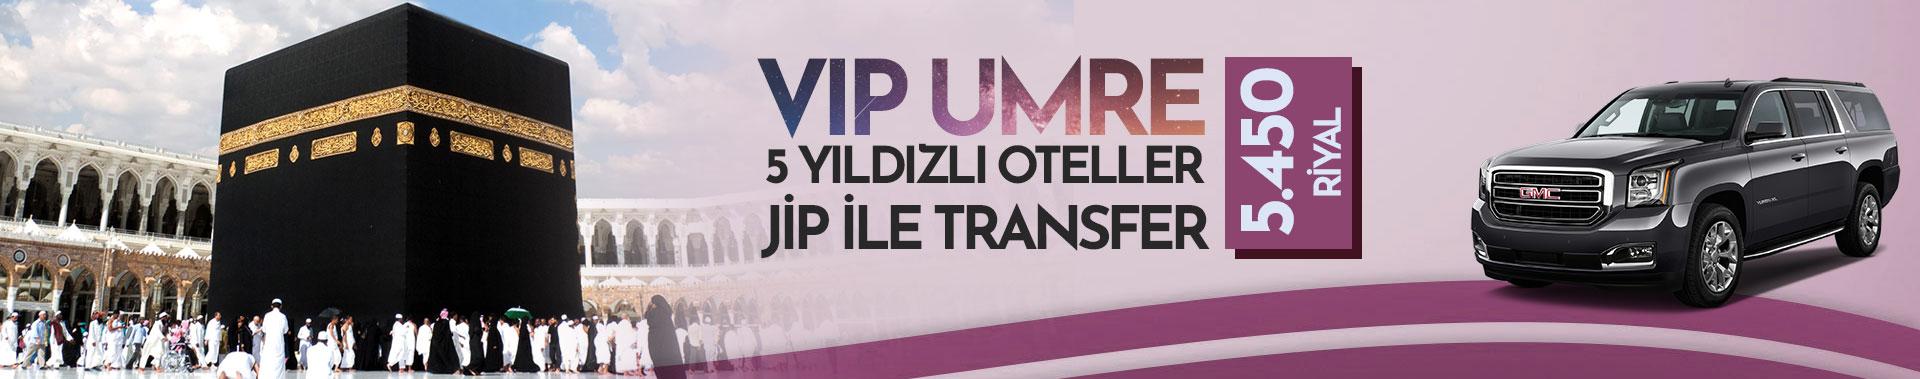 Vip Umre